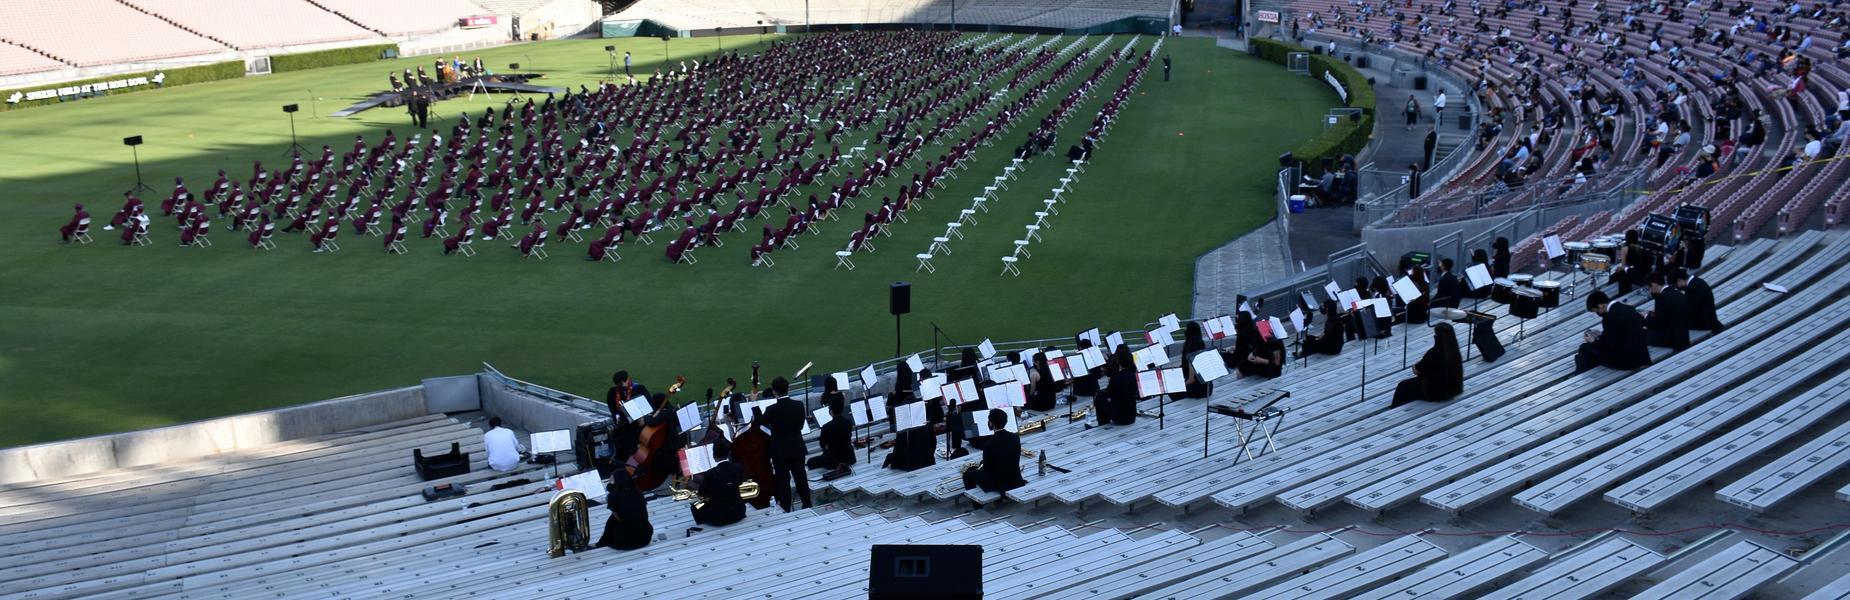 MKHS 2021 Graduation Ceremony